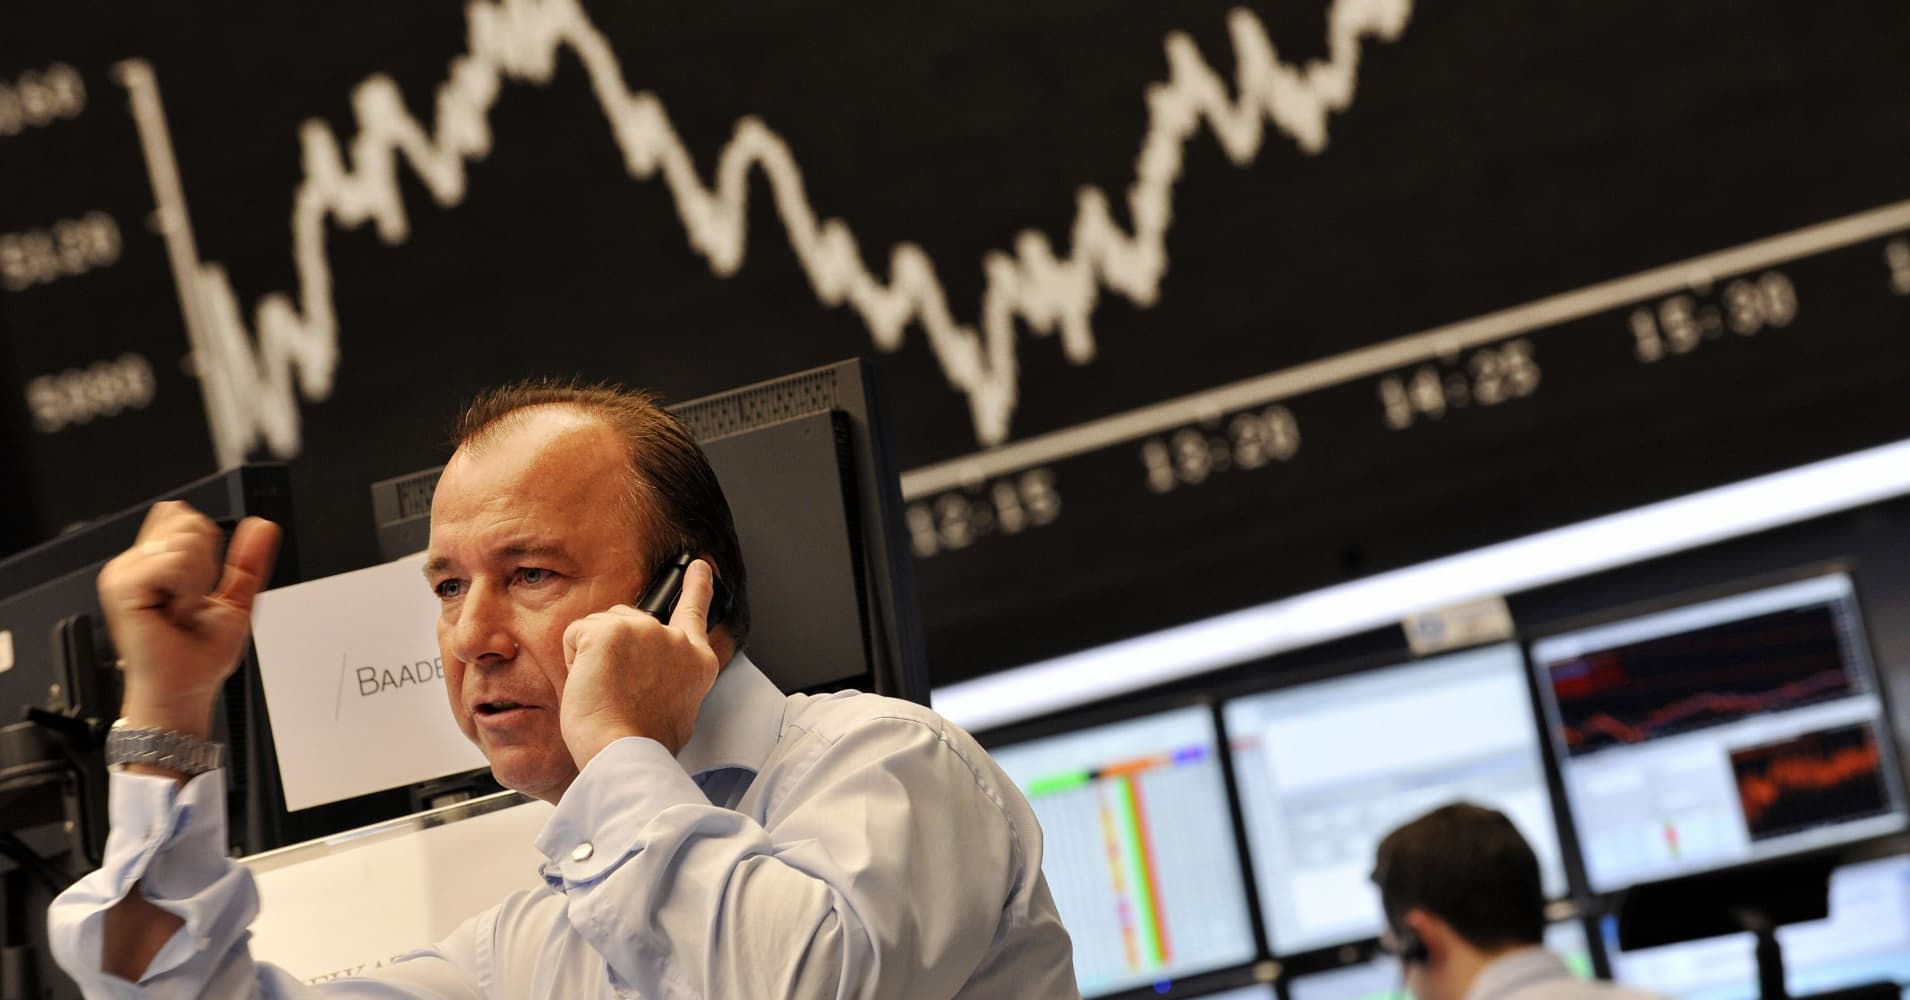 European stocks edge higher despite US-China trade fears; Ericsson up 3%